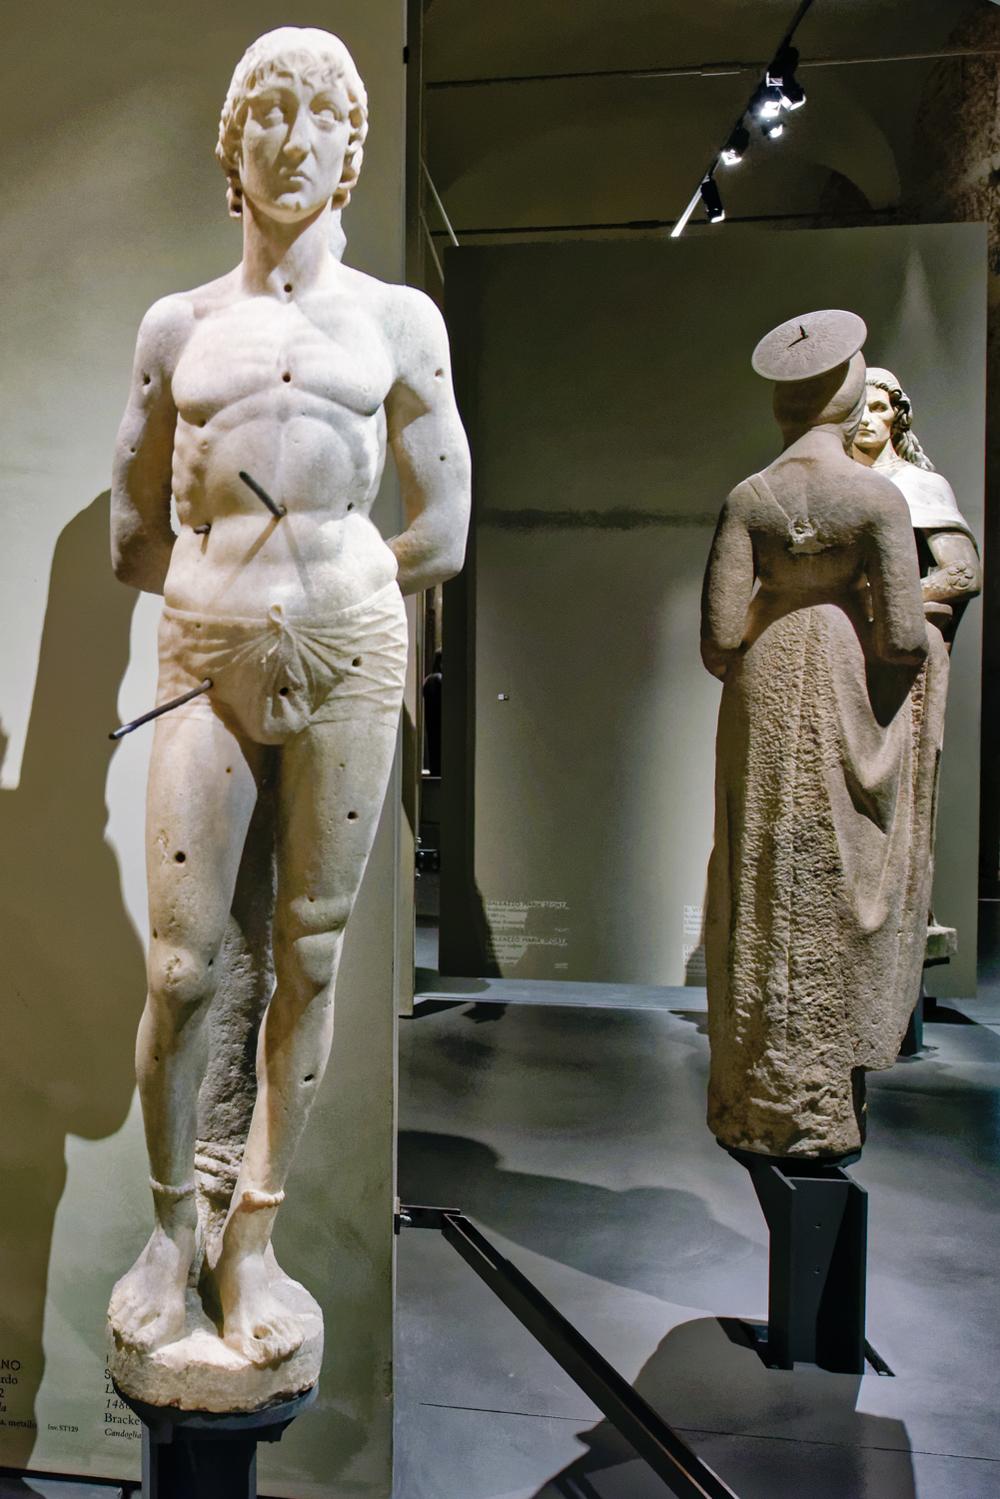 St. Sebastian , Lombard sculptor, 1480-1482. Bracket statue. Duomo di Milano, Museum.